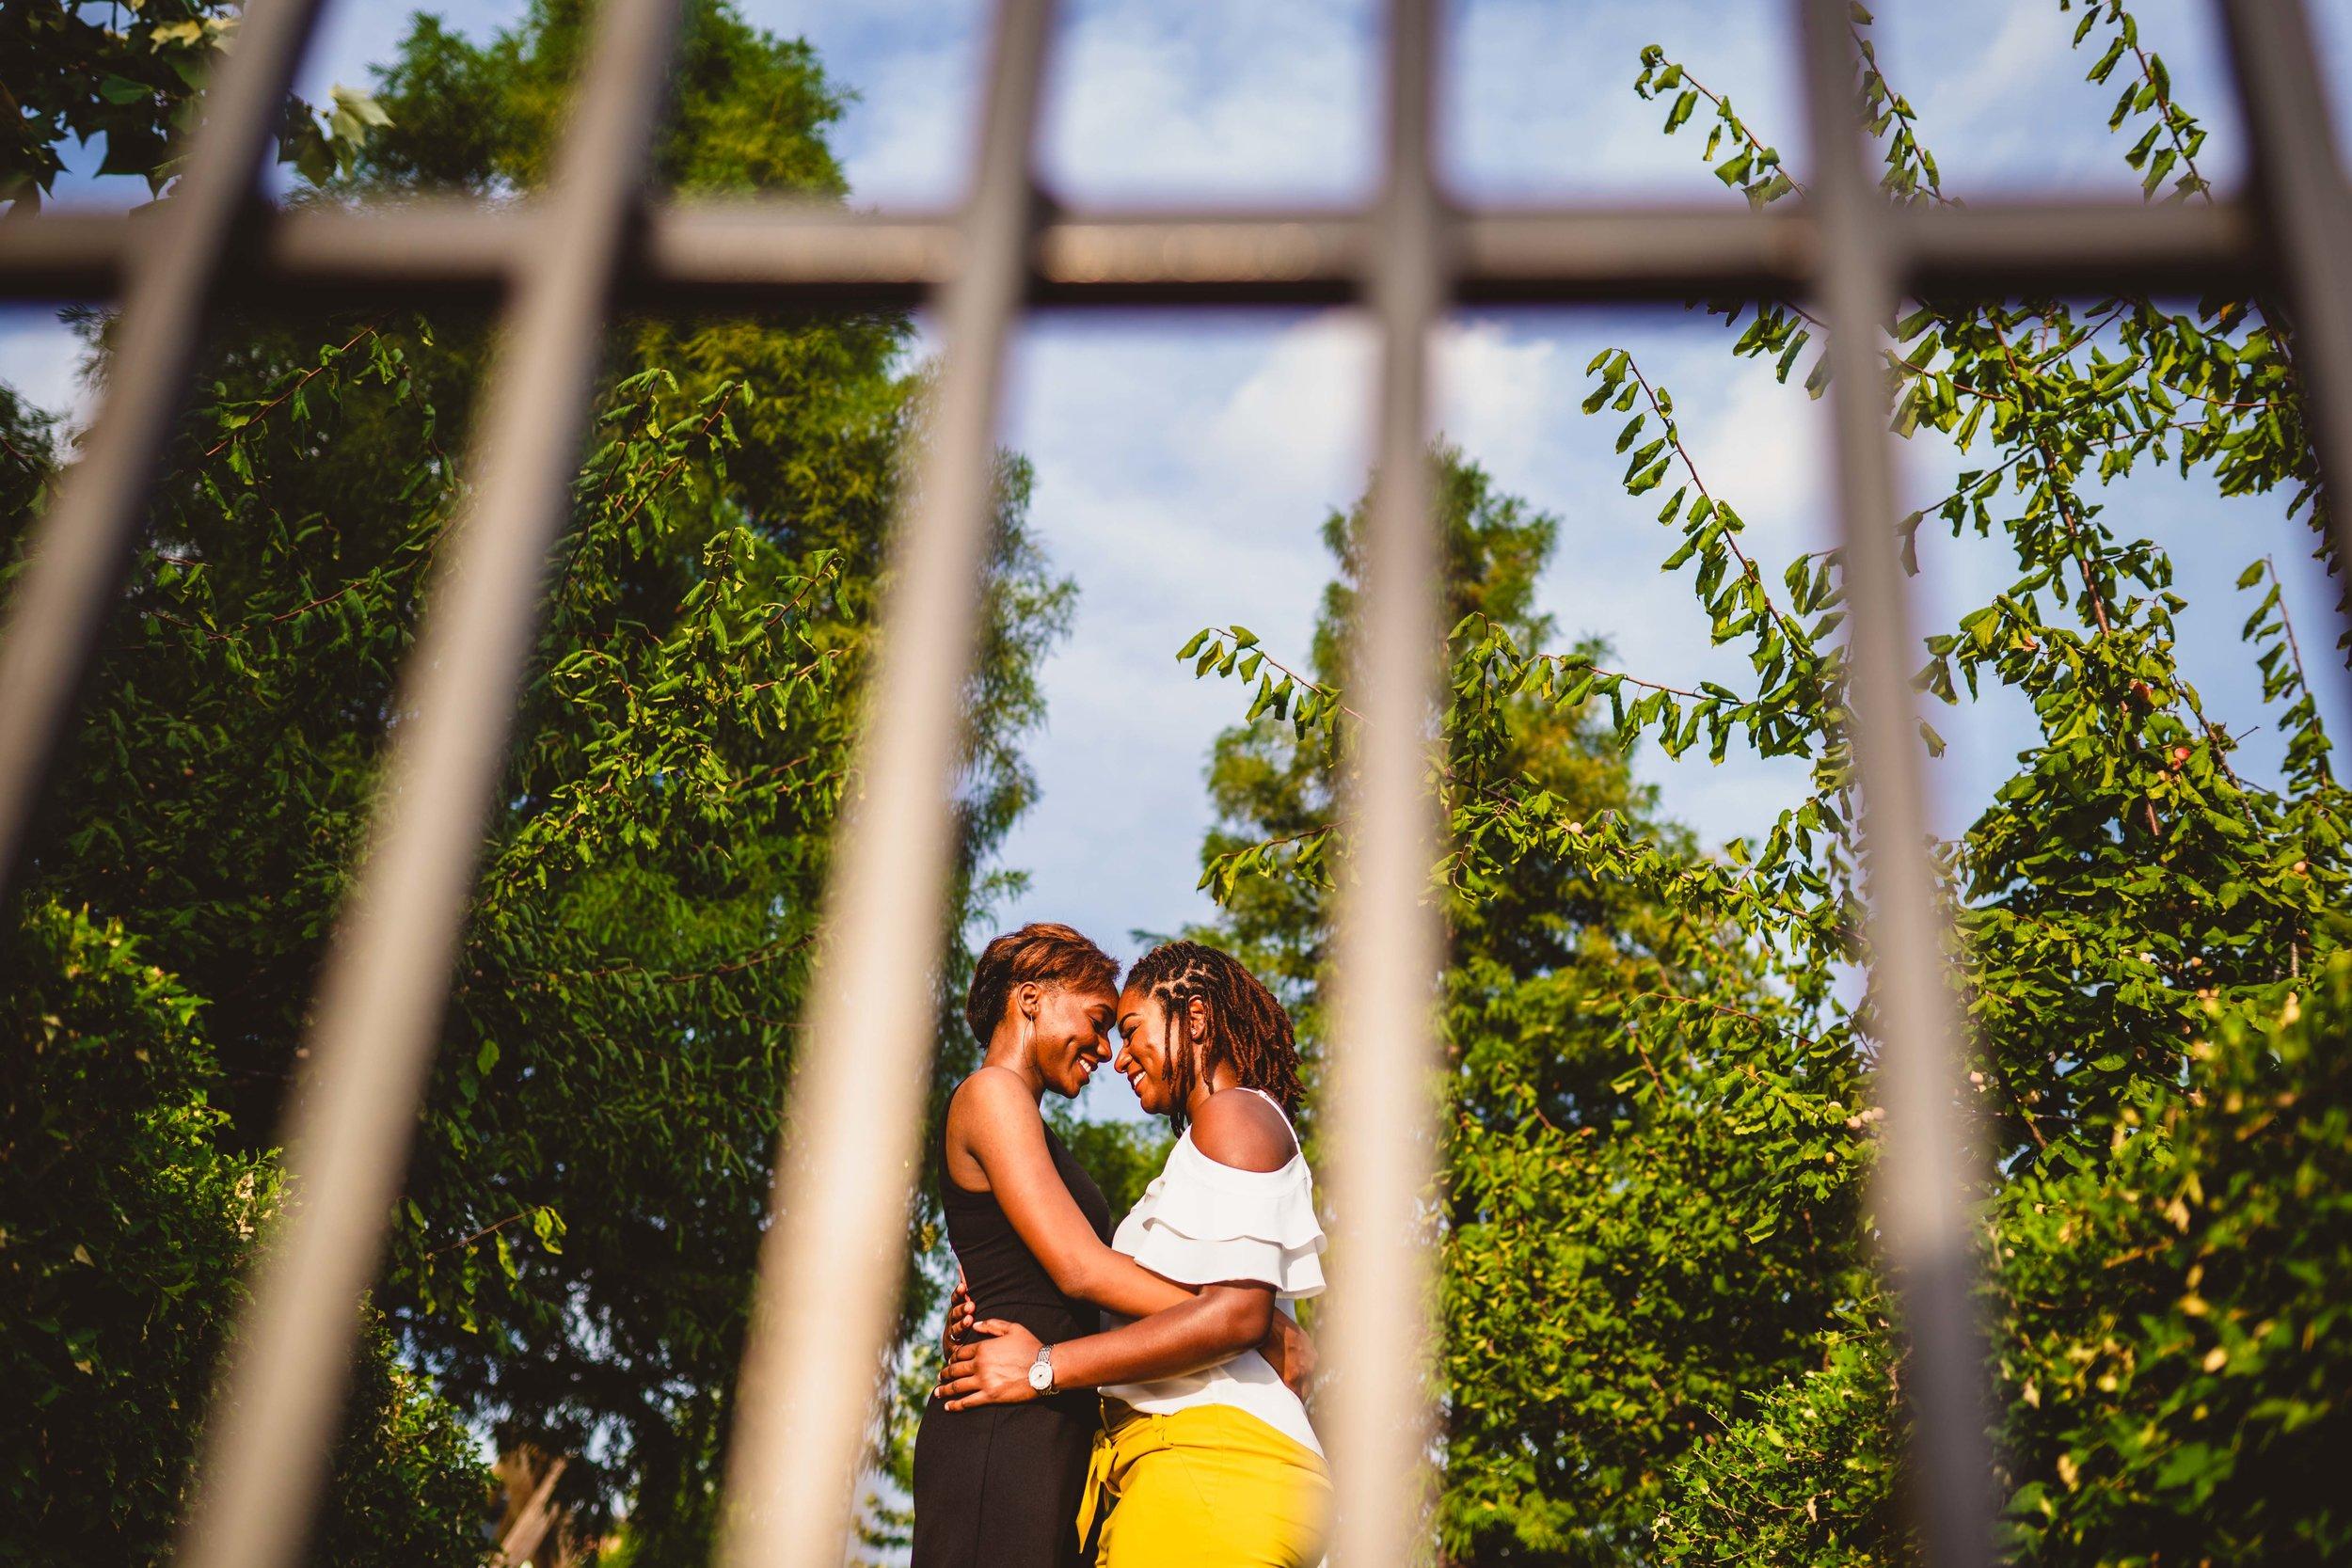 houston-wedding-photographer-photographers-photography-engagement-engagements-session-same-sex-couple-wife-love.jpg